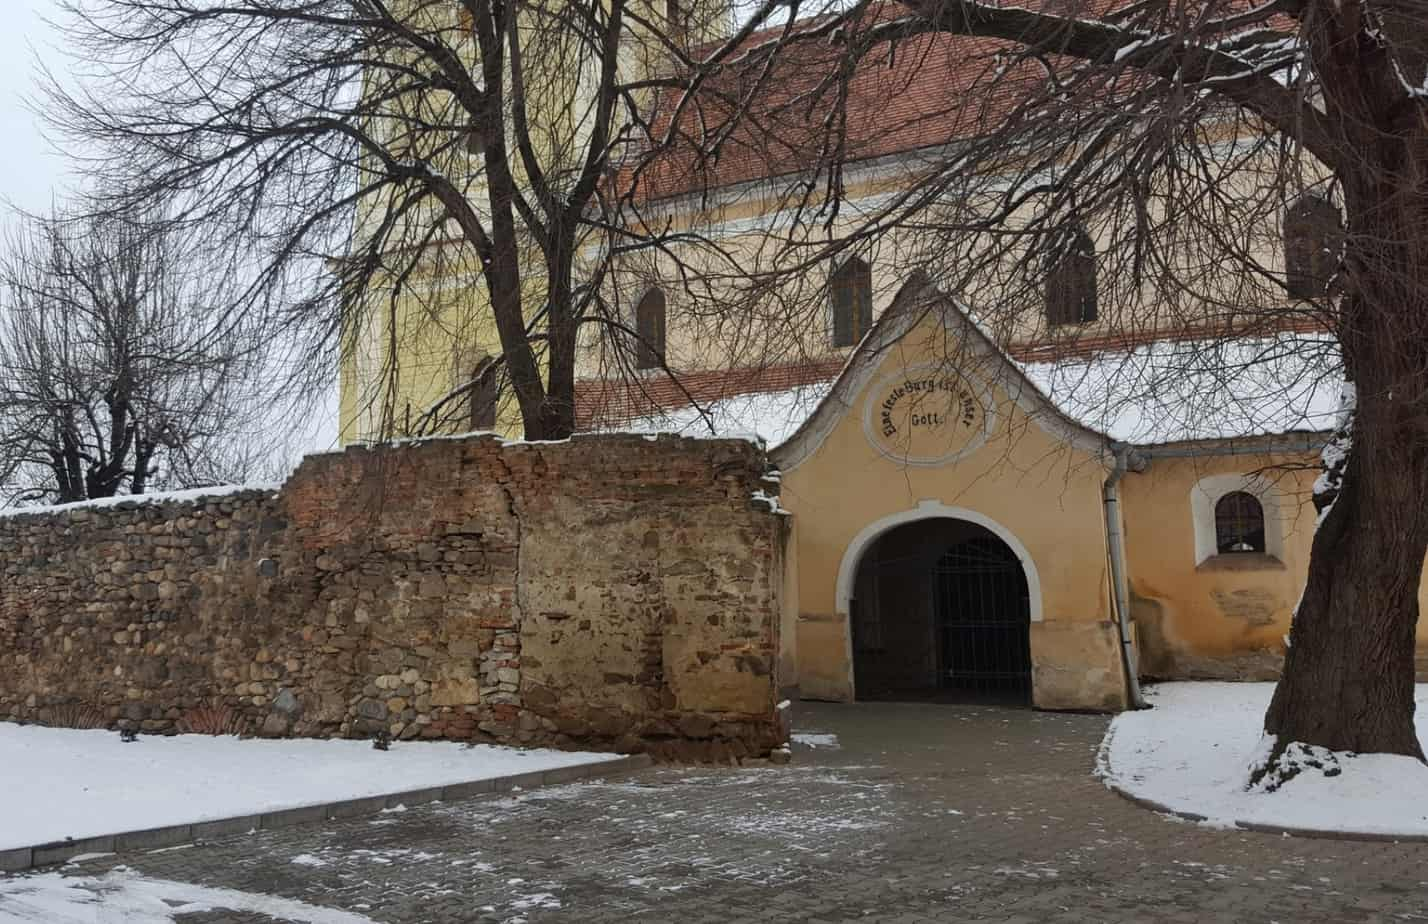 Das Portal der Kirche in Șelimbăr mir Resten der Ringmauer